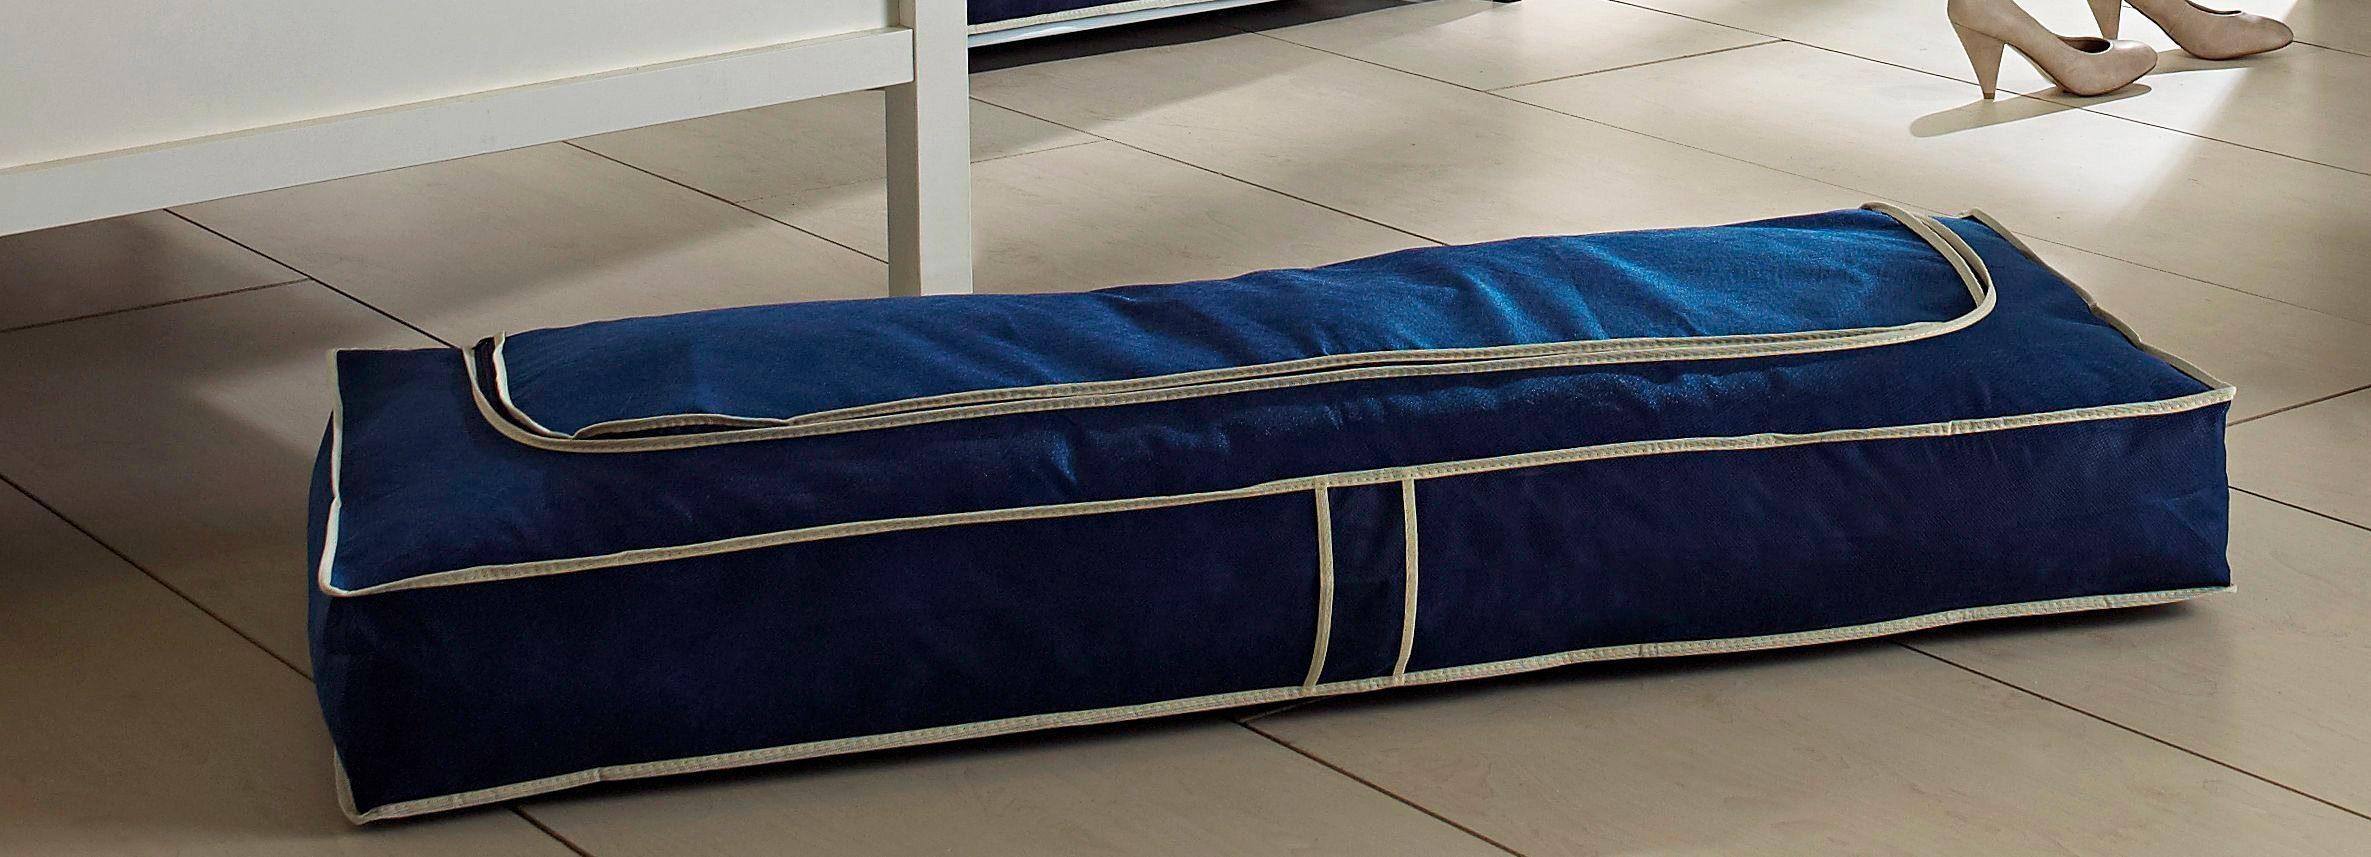 Unterbettkommode »Größe L, blau, 2er-Set«